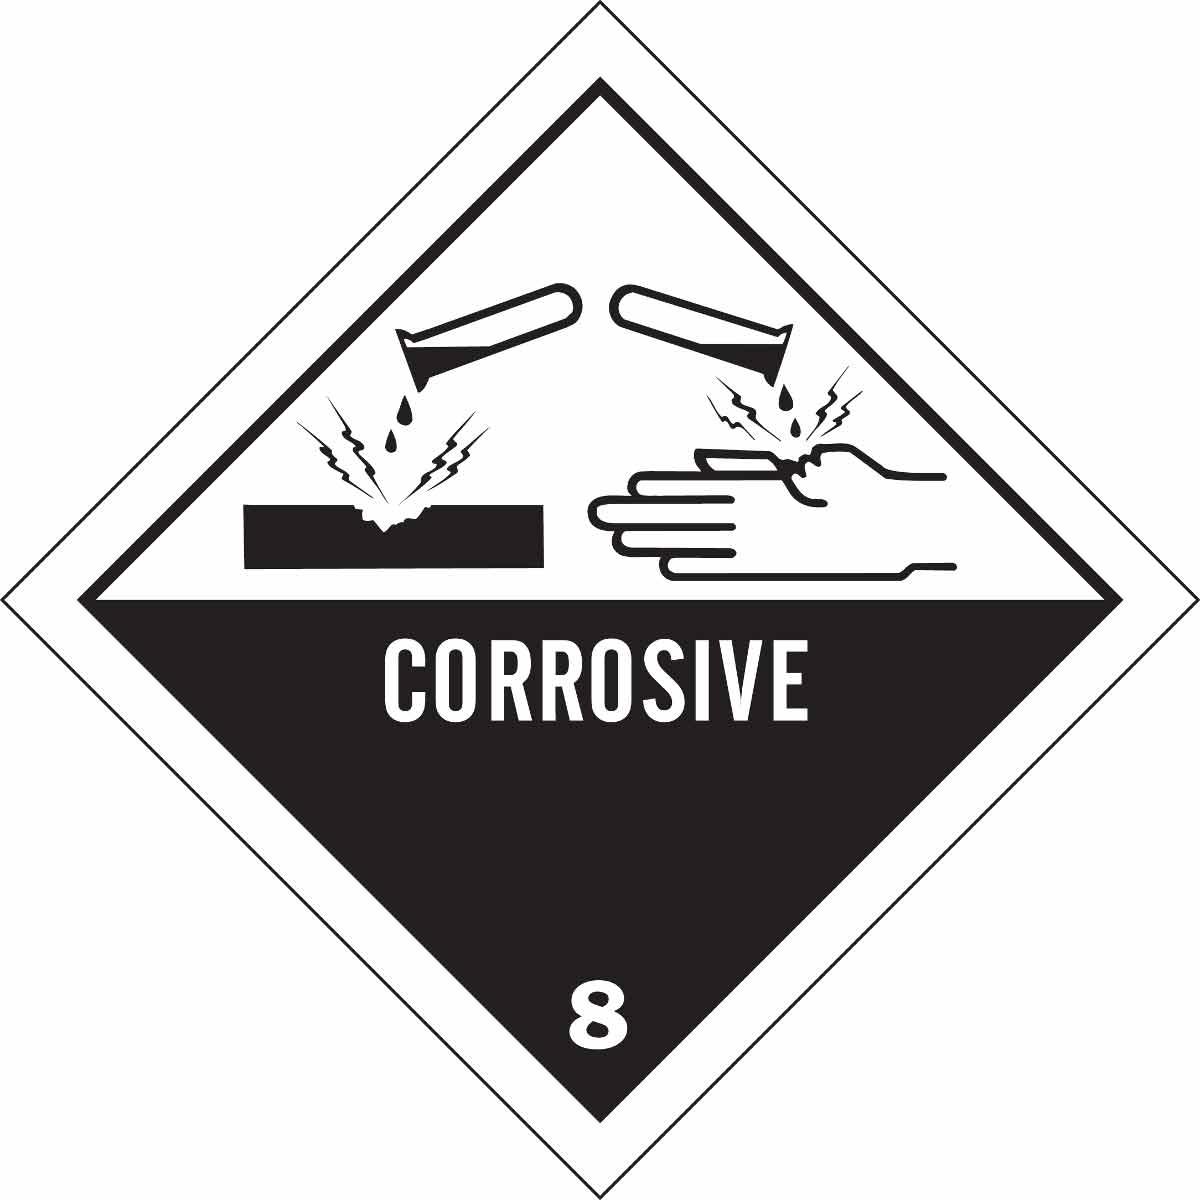 Brady Part 121070 Corrosive 8 Hazardous Material Shipping Labels